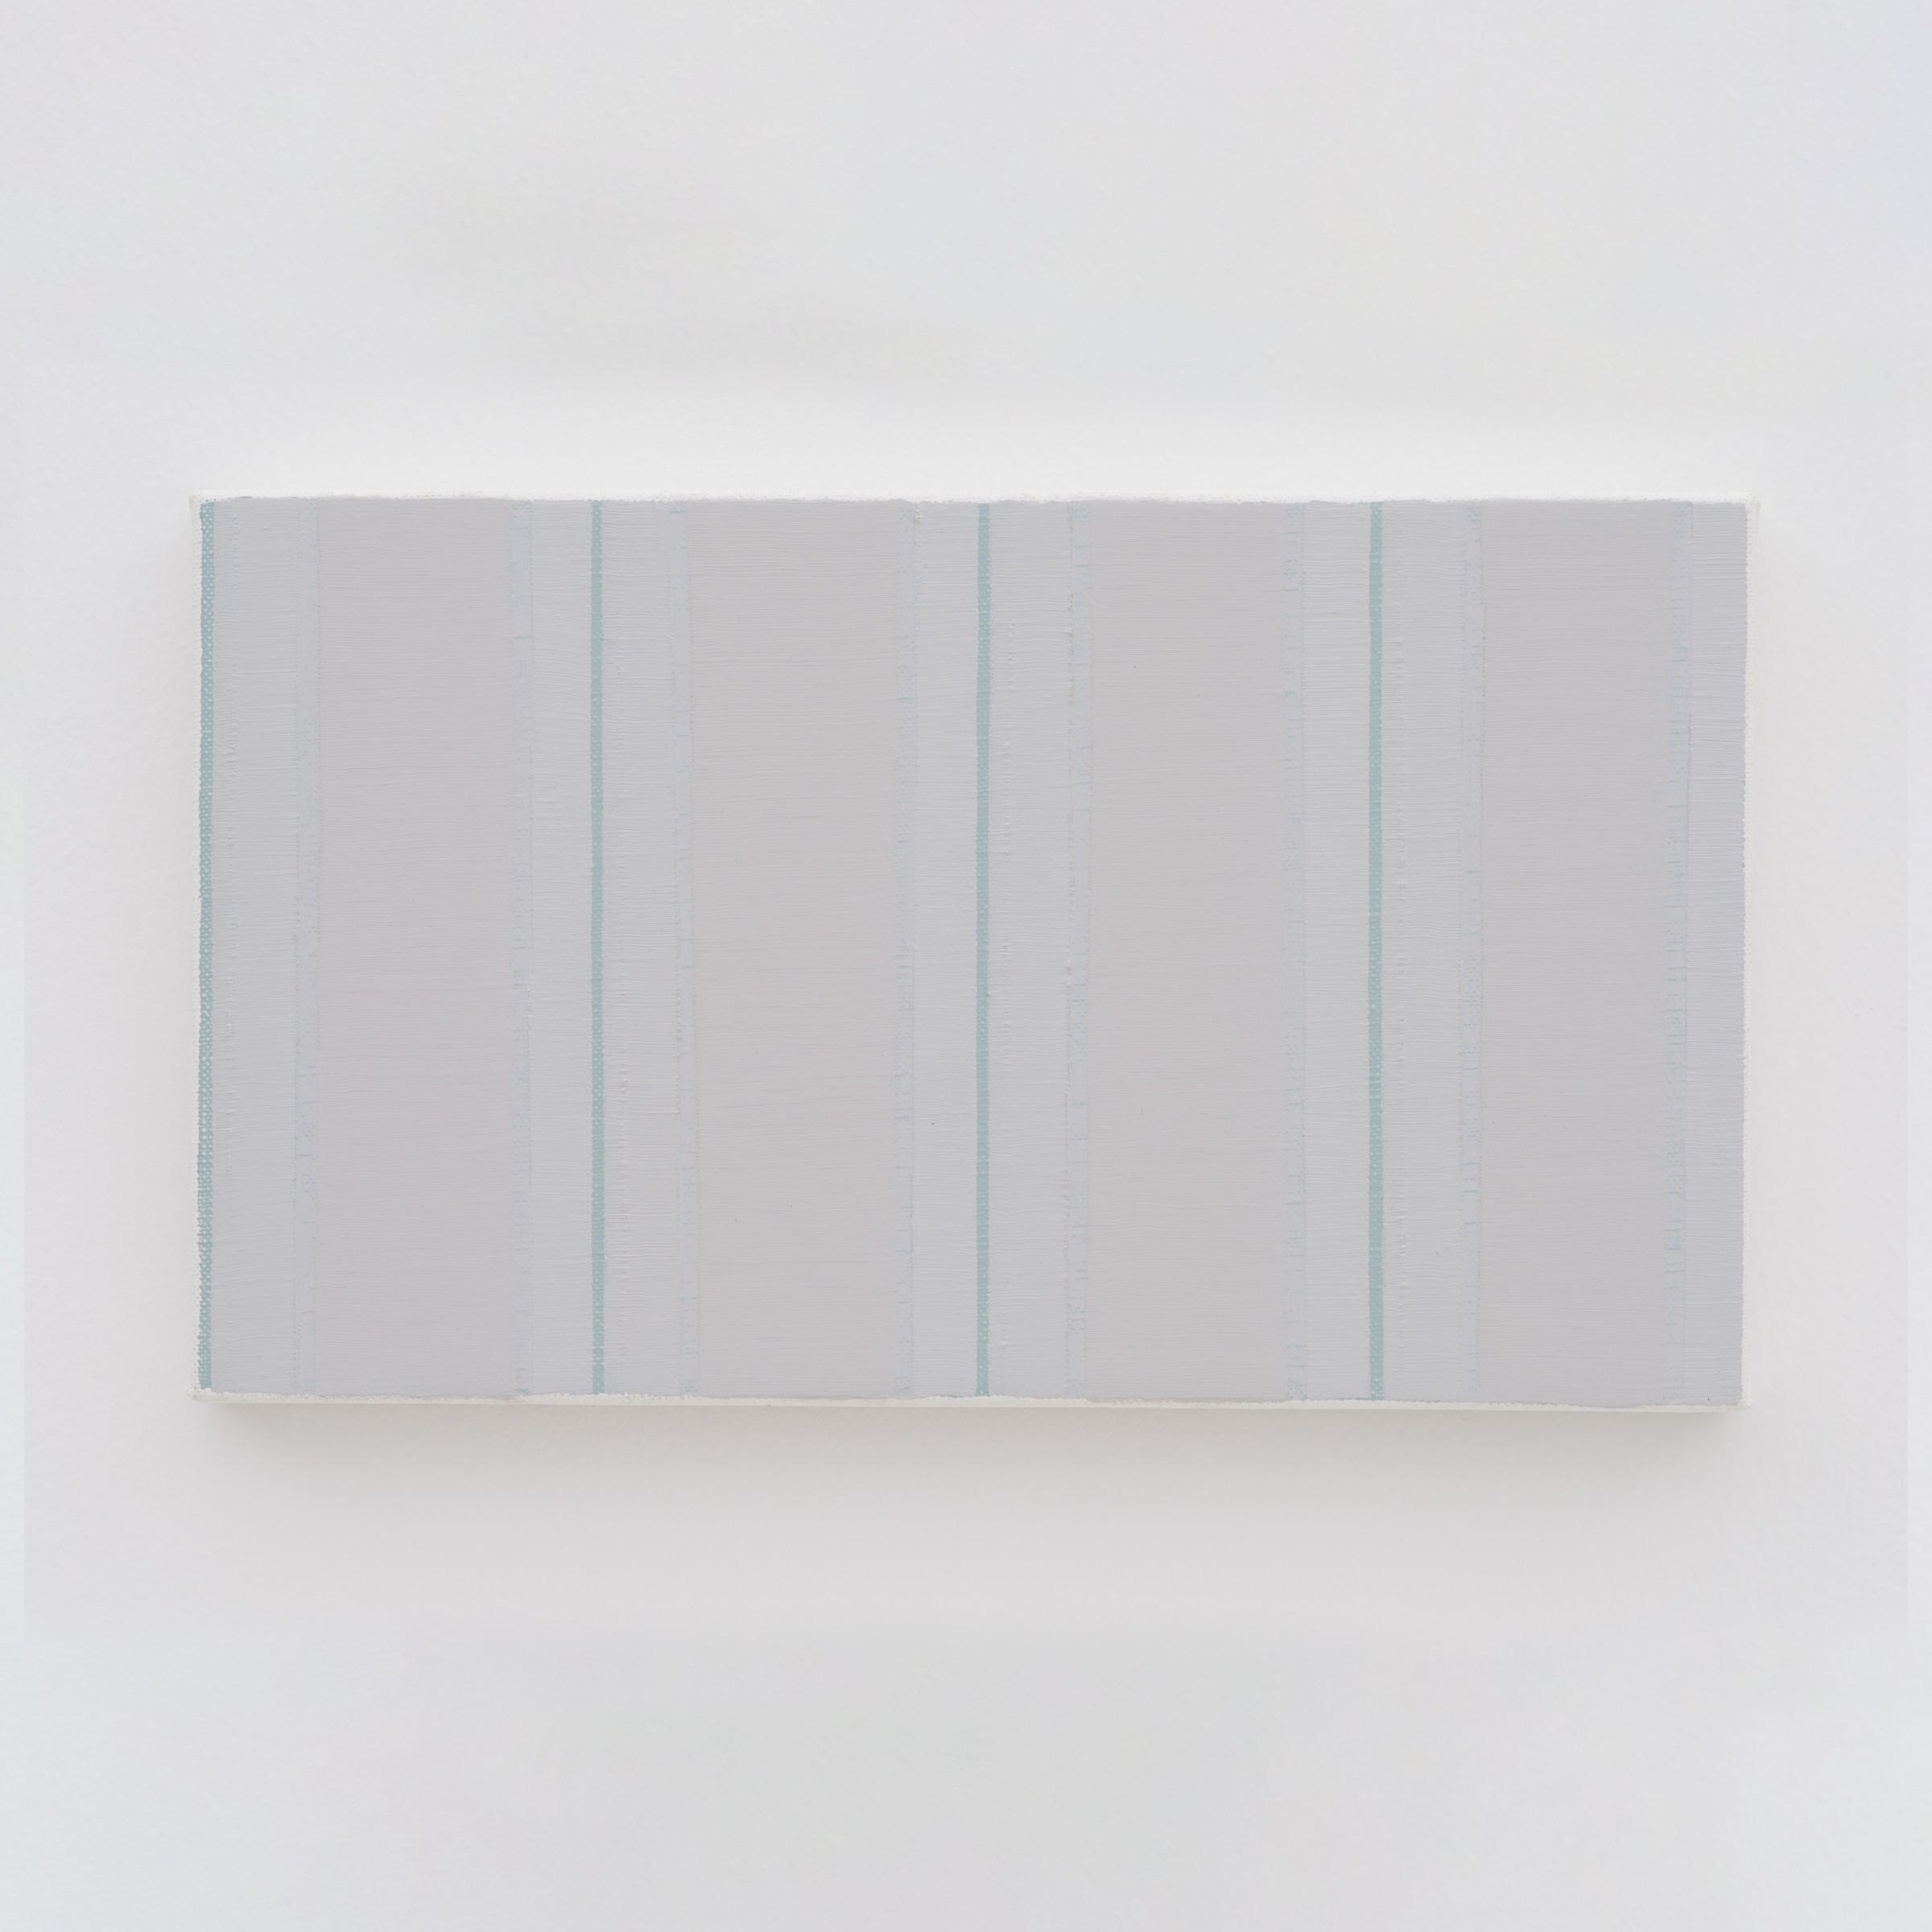 "<span class=""link fancybox-details-link""><a href=""/exhibitions/172/works/artworks16574/"">View Detail Page</a></span><div class=""artist""><strong>Yui Yaegashi</strong></div><div class=""title""><em>white-grey-black No.6</em>, 2019</div><div class=""medium"">oil on canvas</div><div class=""dimensions"">16,5 x 28 cm</div>"